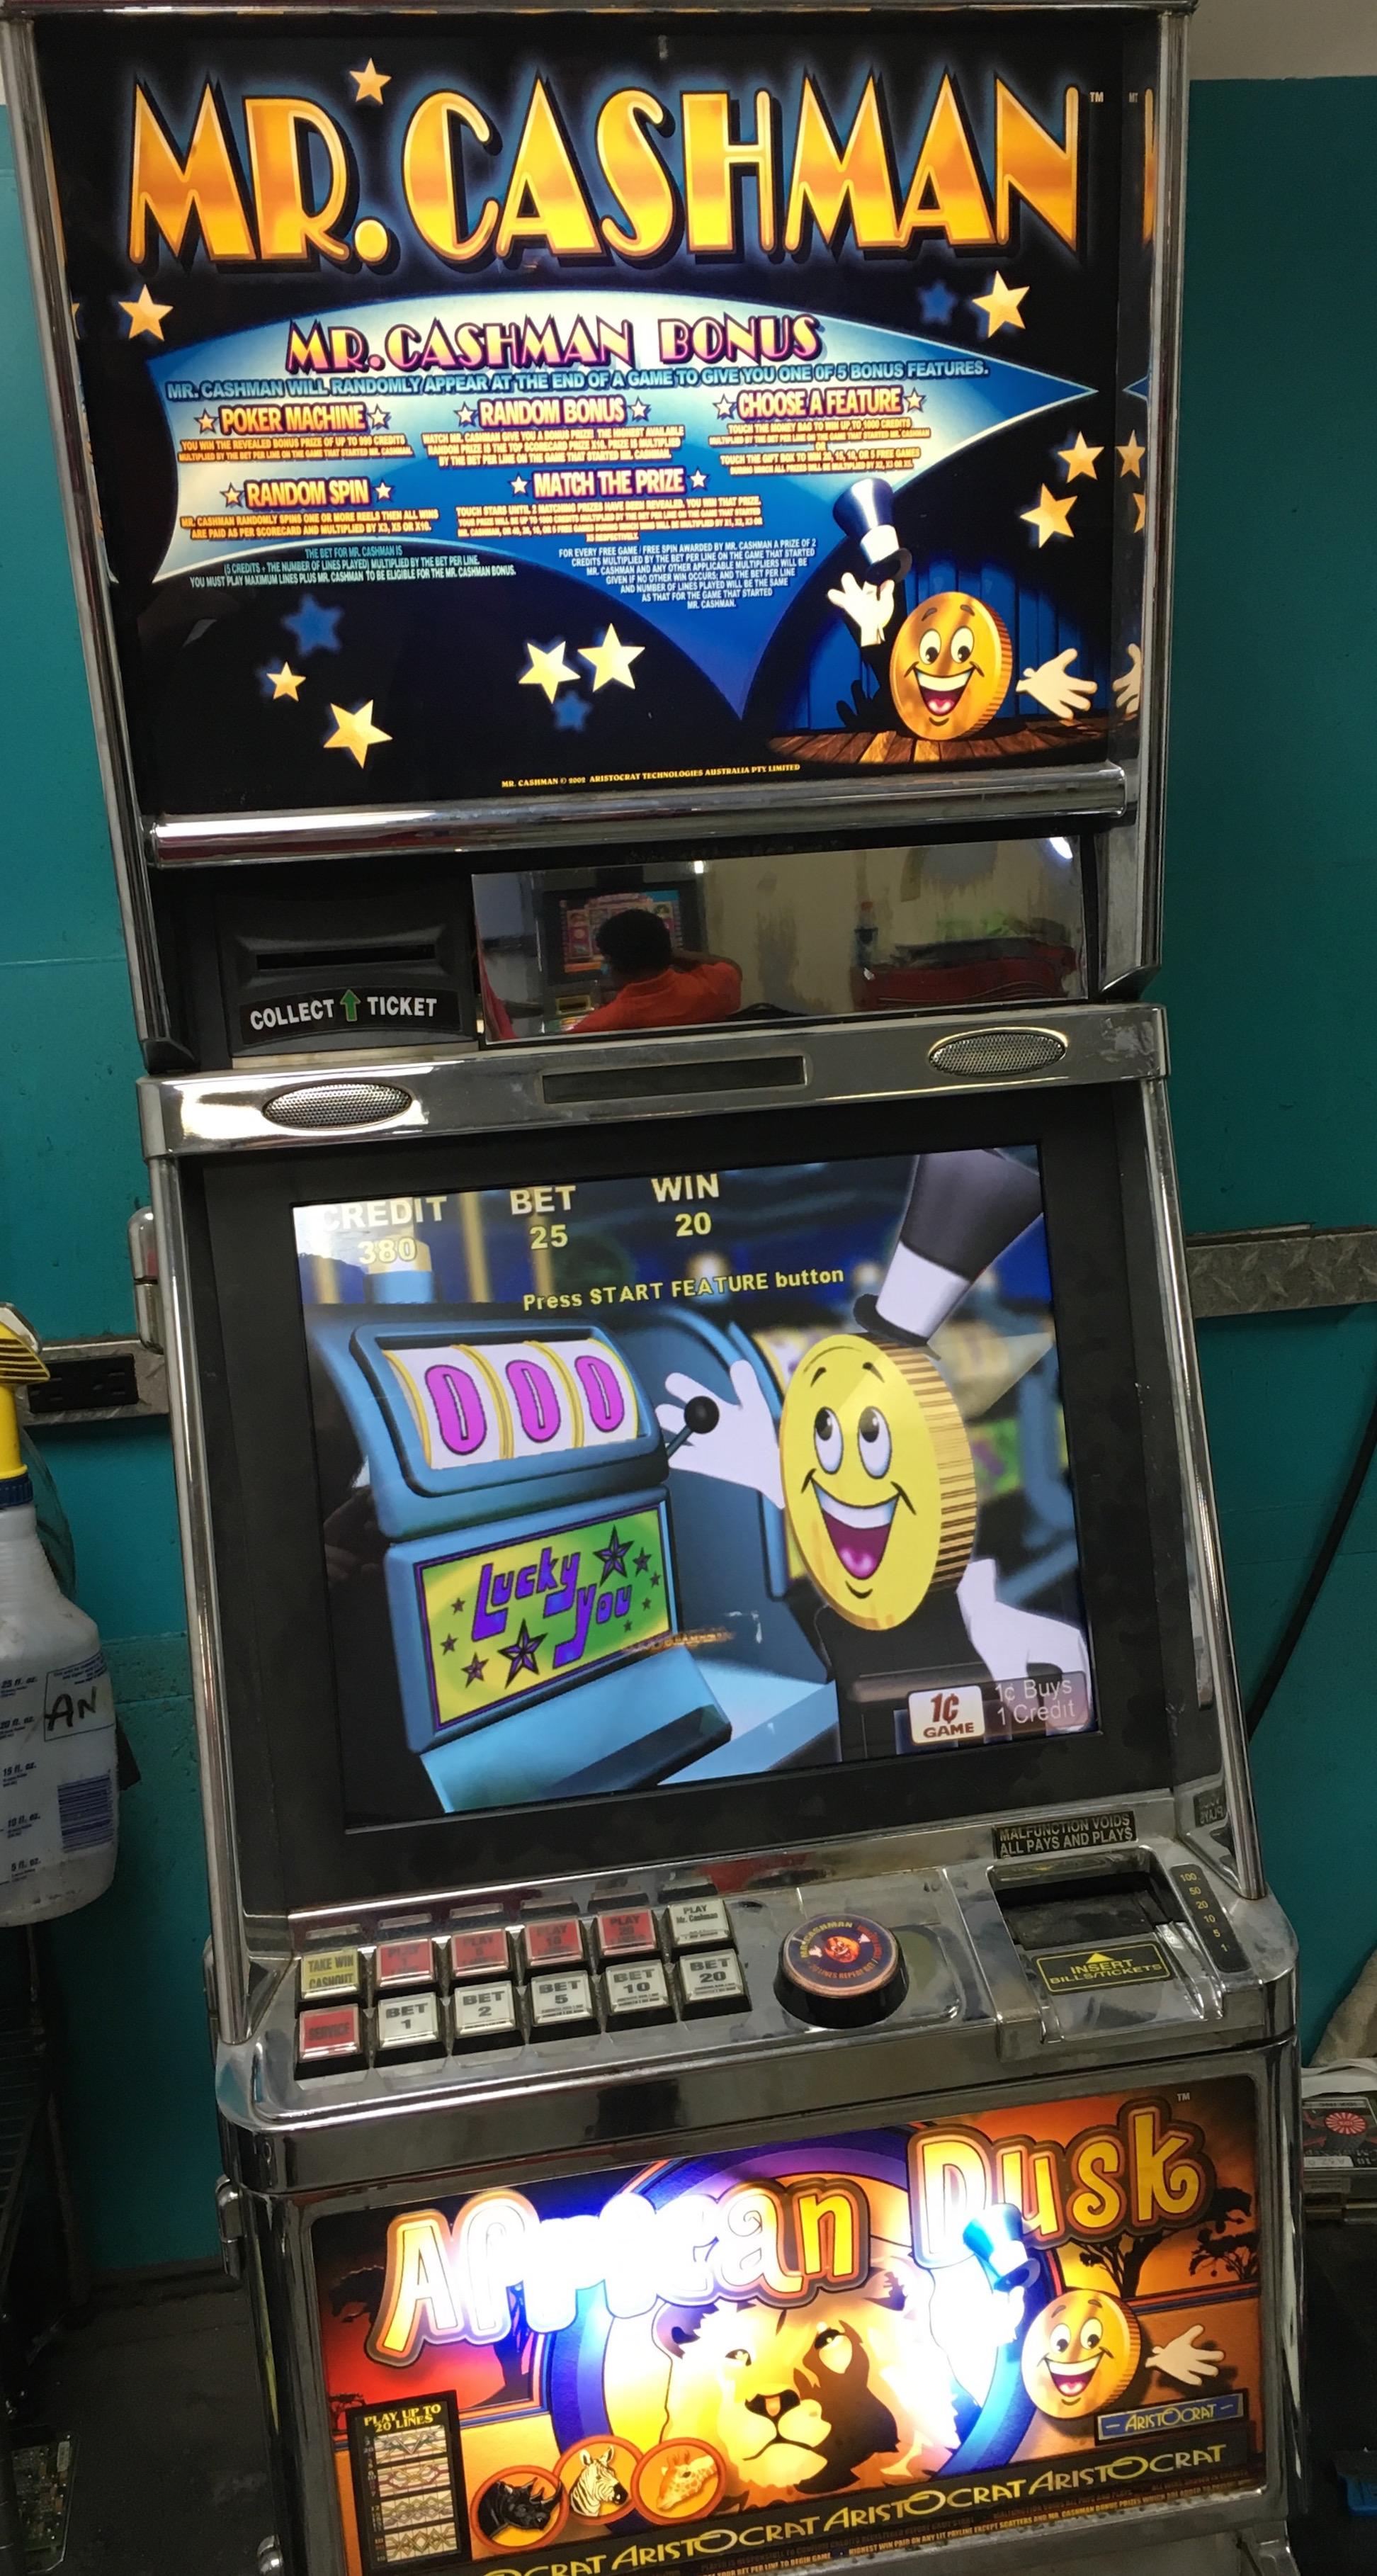 Aristocrat slot machines download gambling indianapolis